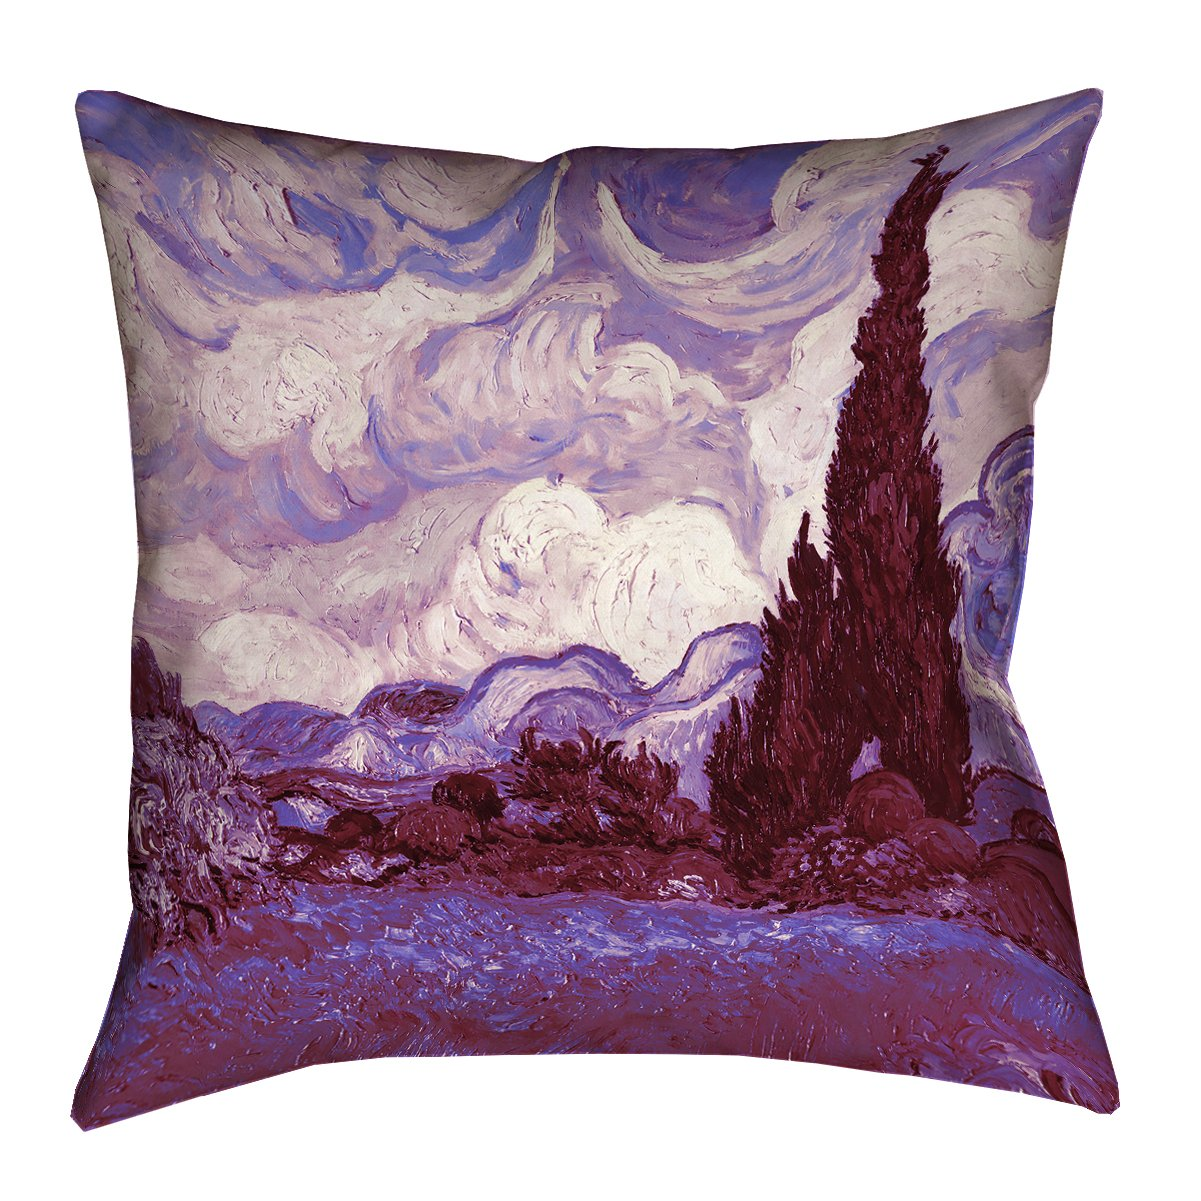 ArtVerse VAN022P1818G Mauve Wheatfield with Cypresses Pillow 18 x 18